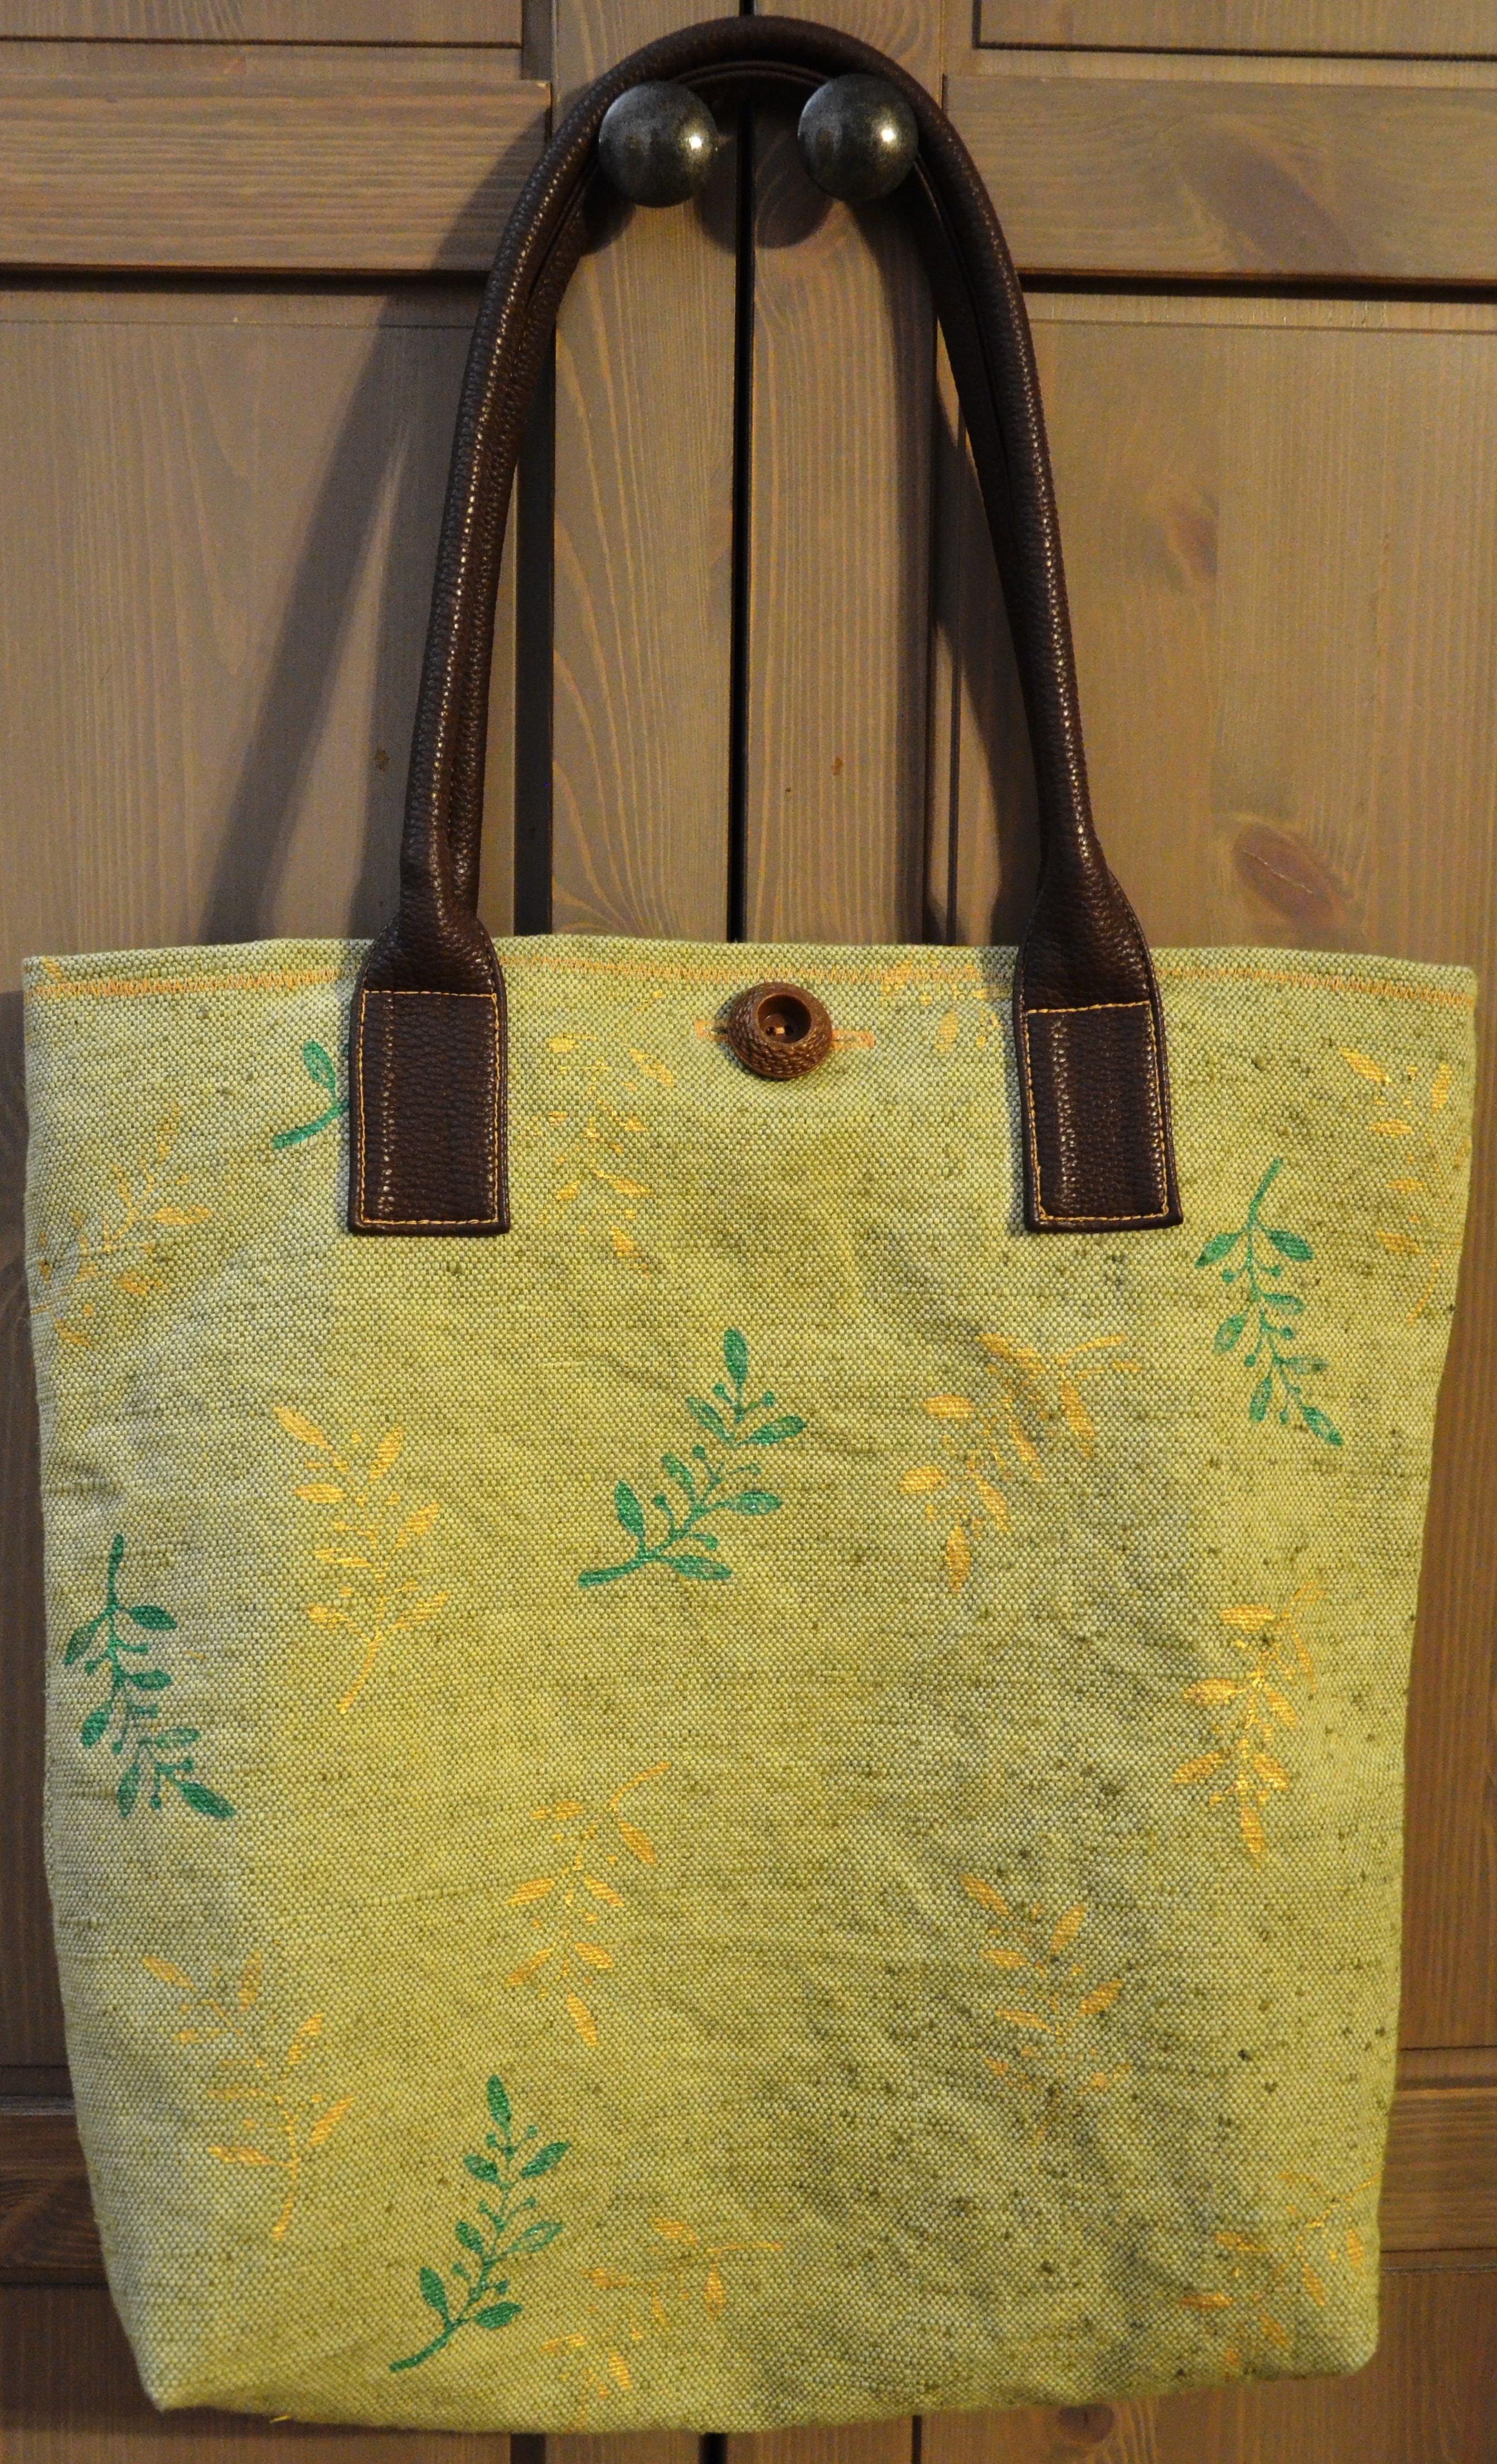 сумка набойка экостиль handmade